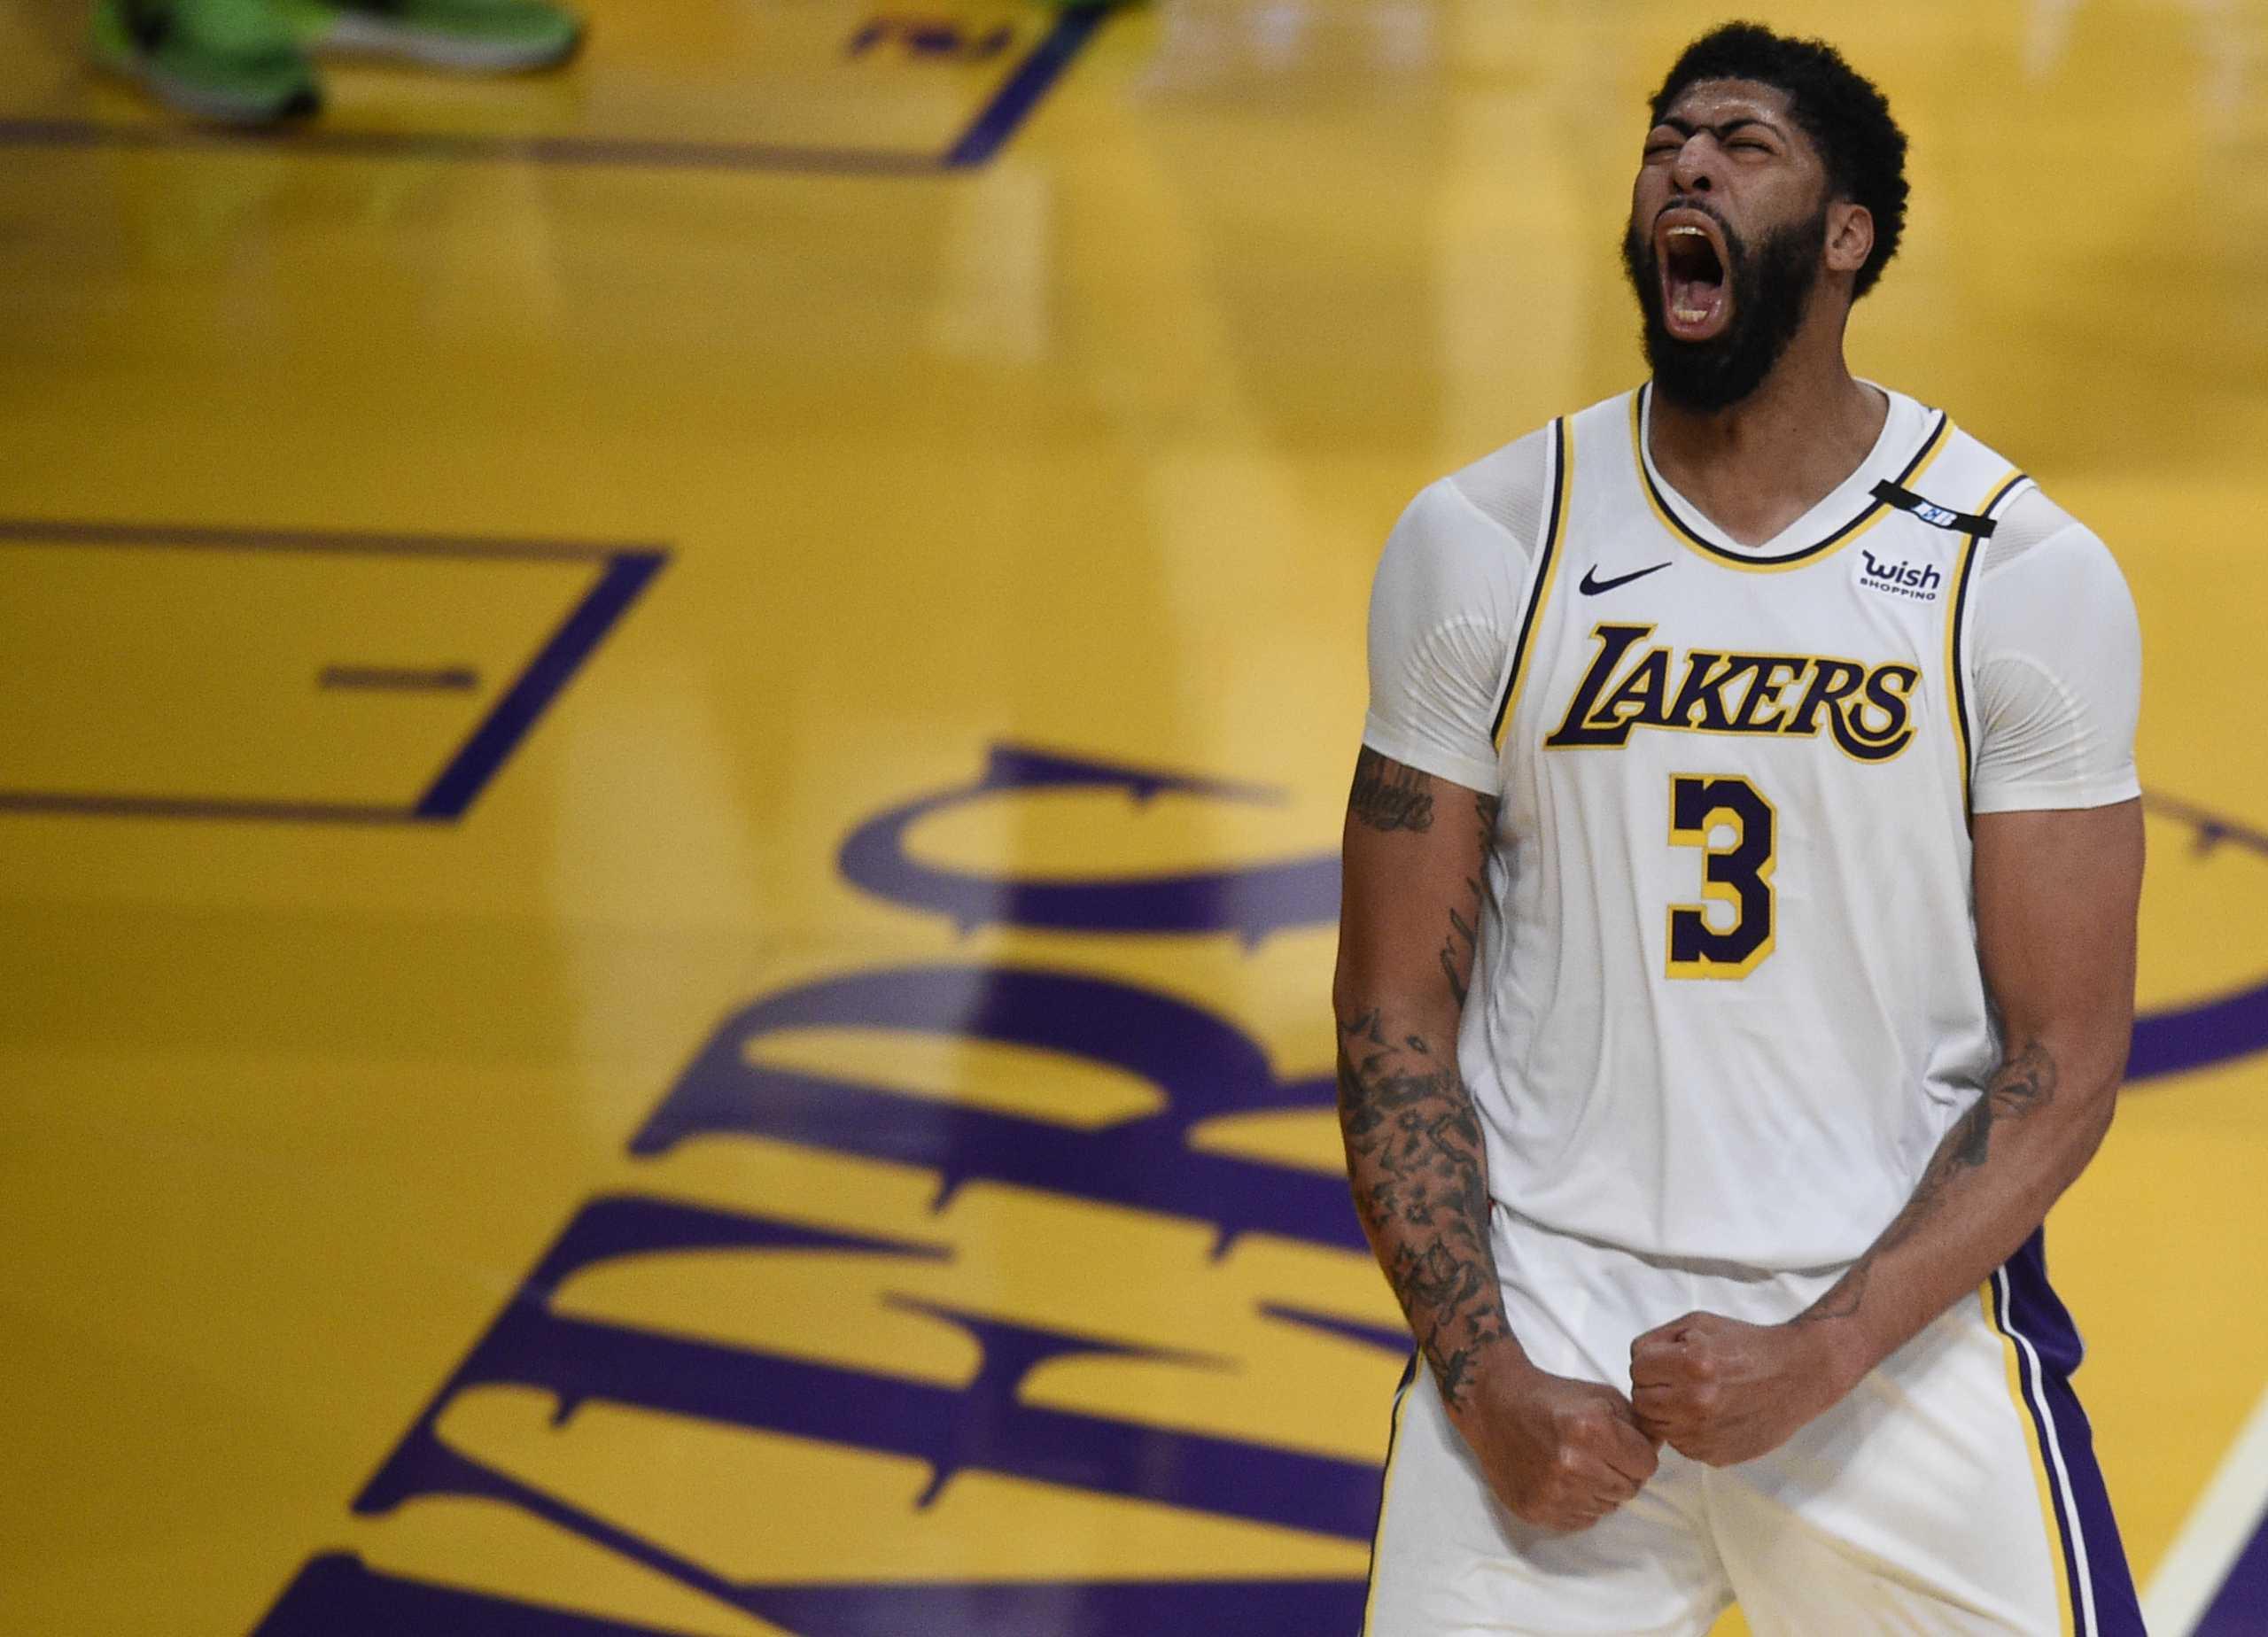 NBA: Προβάδισμα με super Ντέιβις για τους Λέικερς – Μπρέικ για τους Νάγκετς με ευρωπαϊκή υπογραφή